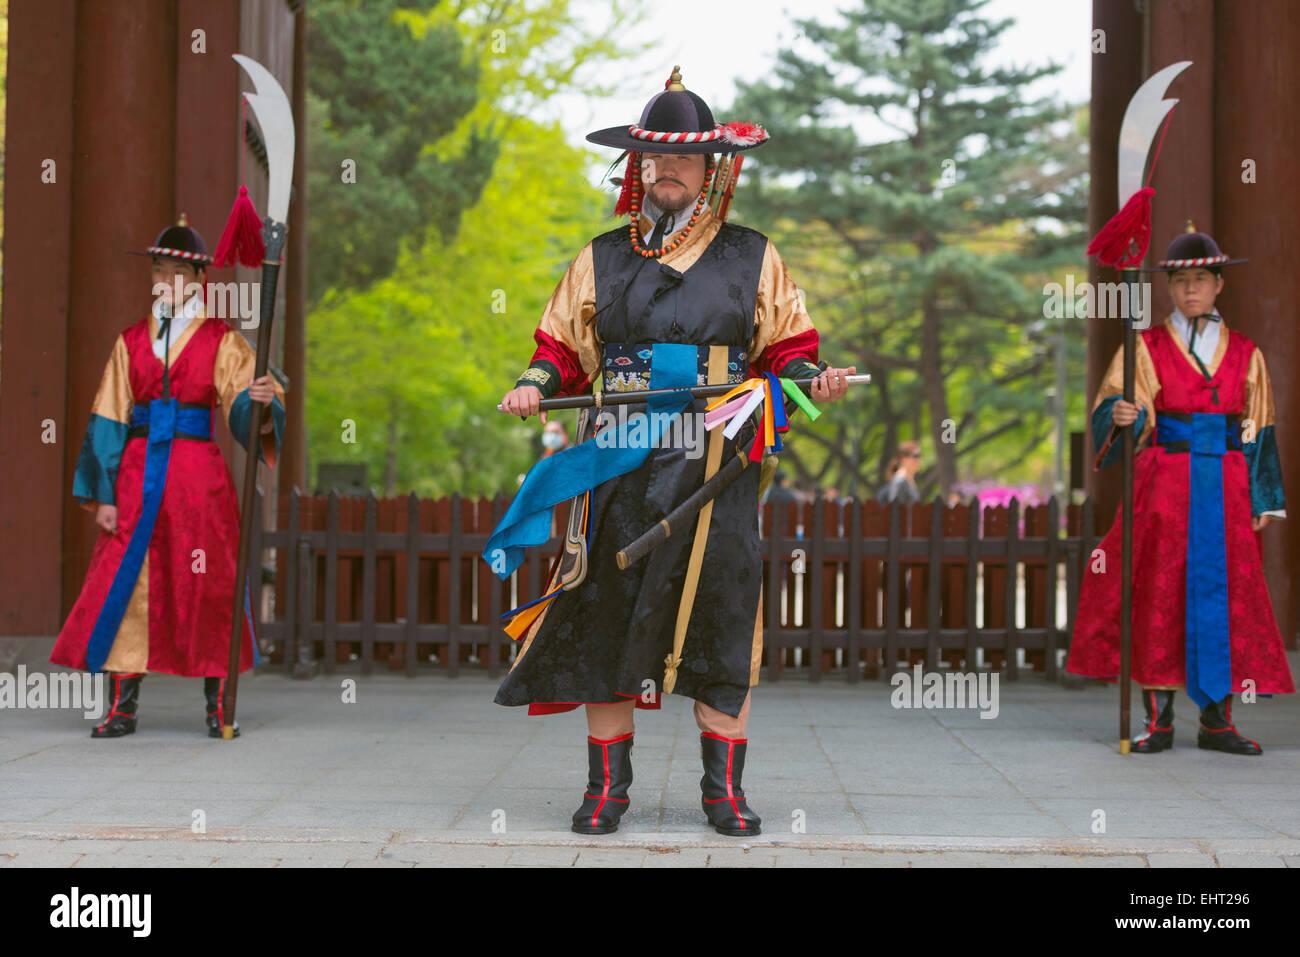 Asia, Republic of Korea, South Korea, Seoul, Deoksugung palace, changing of the guards ceremony Stock Photo